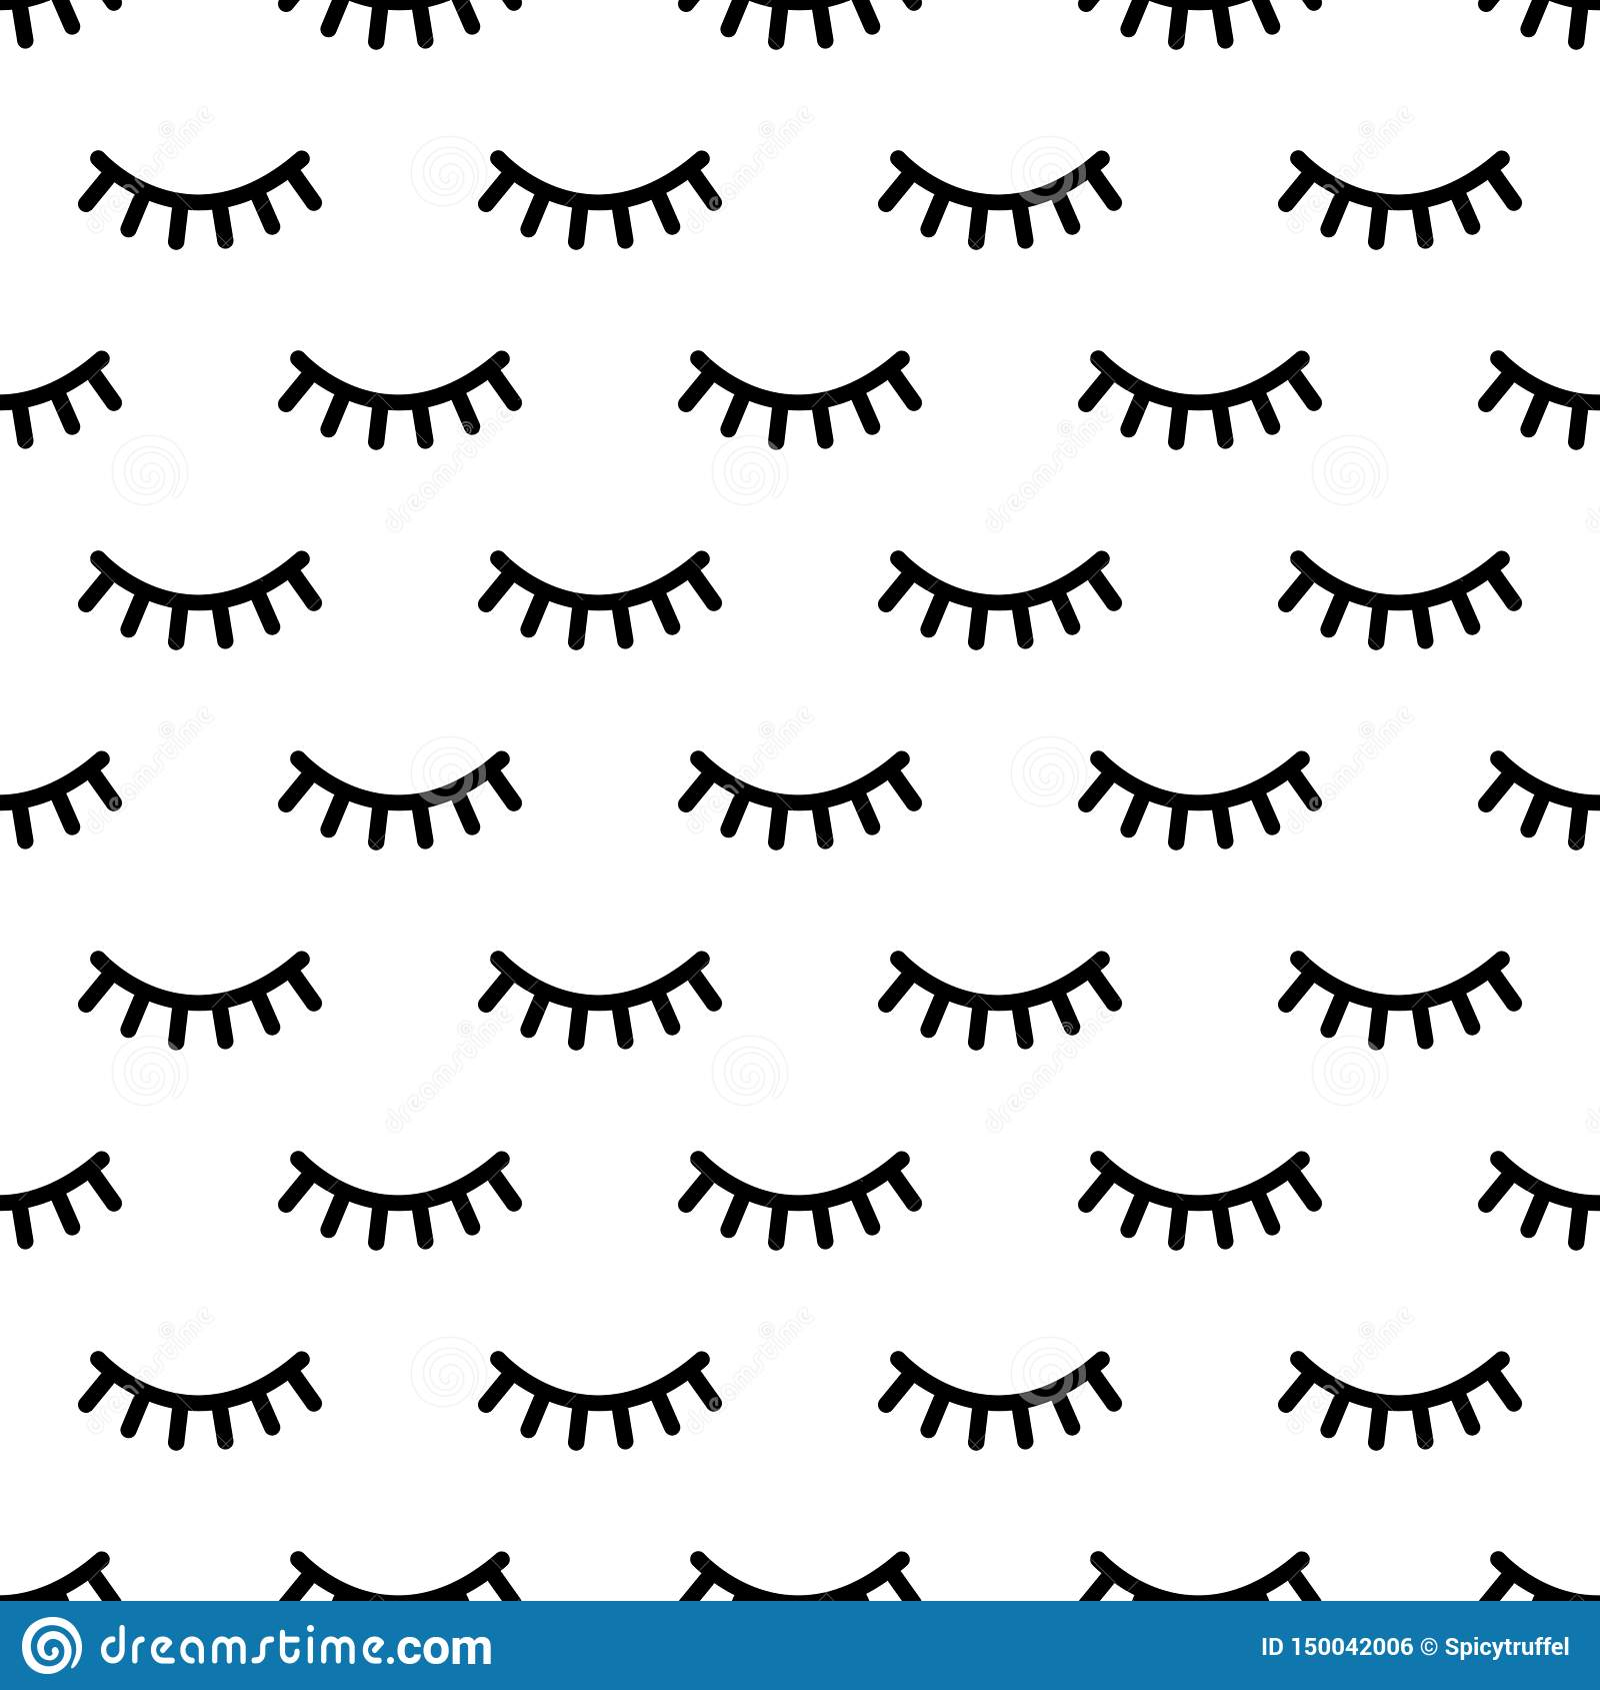 Cartoon eyelashes pattern. Doodle female makeup background, simple minimalist unicorn closed eyes. Vector seamless print